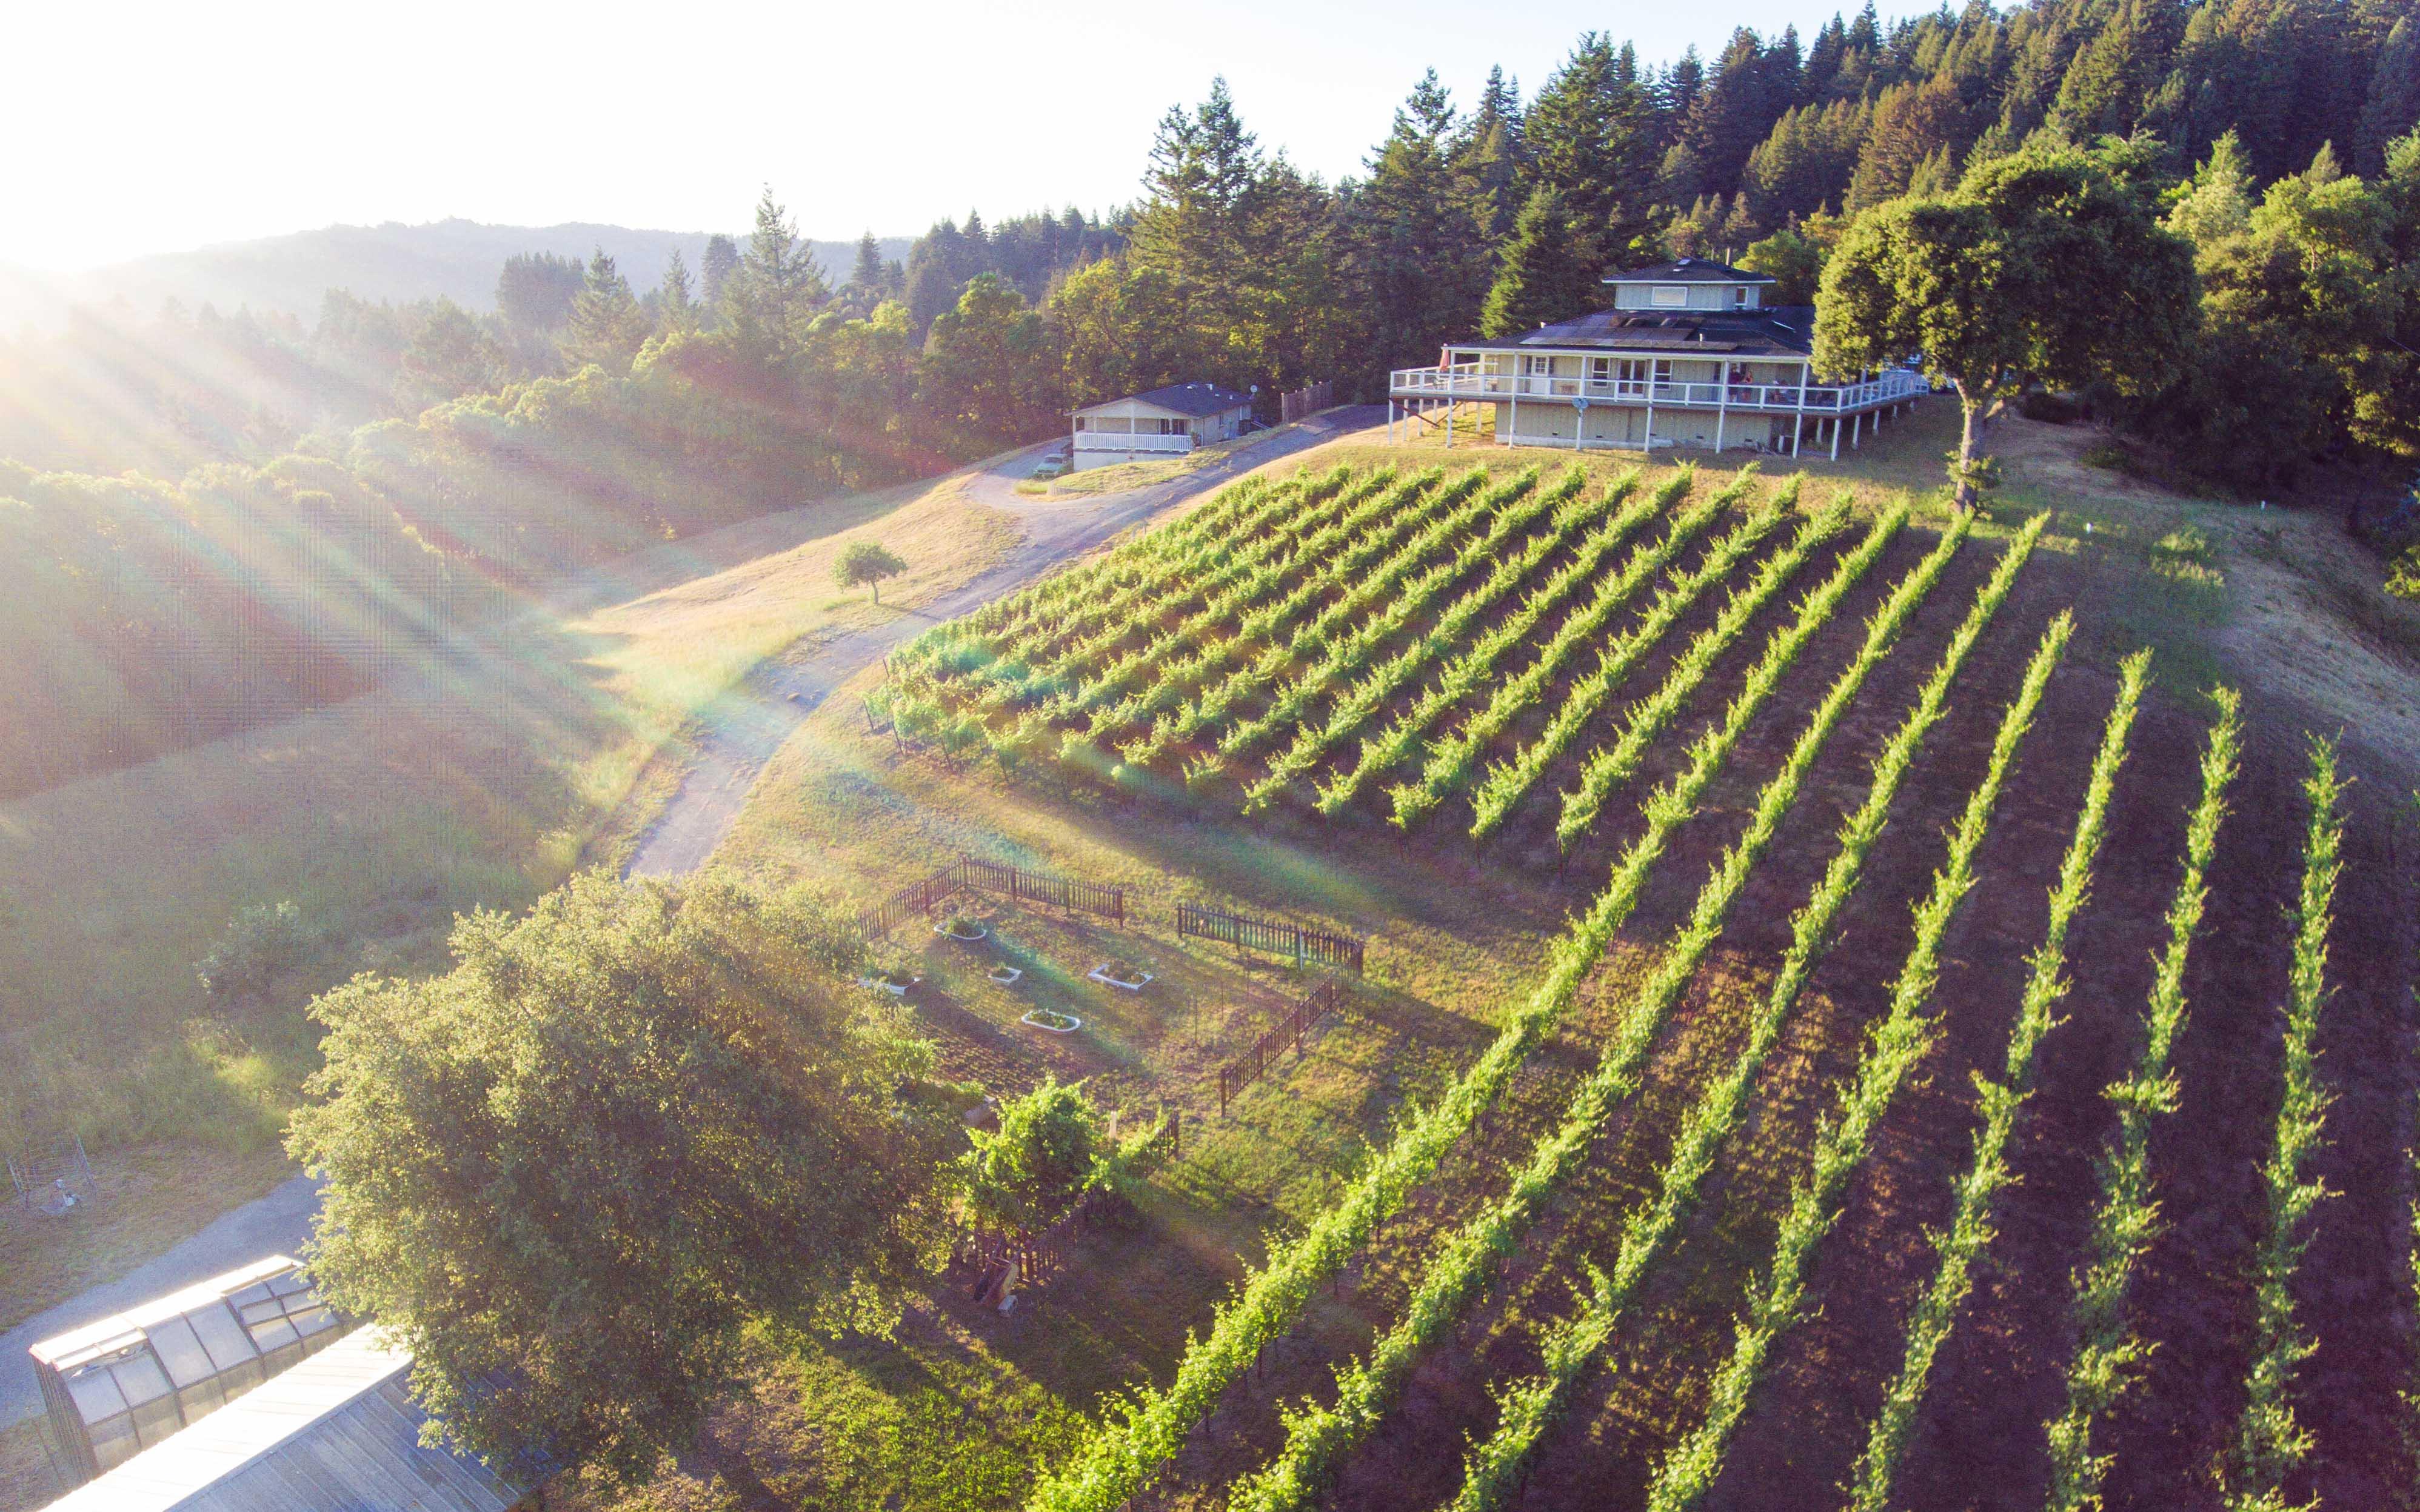 Aerial view of DaLarDi Vineyard, where Aptos Vineyard got their 2018 and 2019 pinot grapes